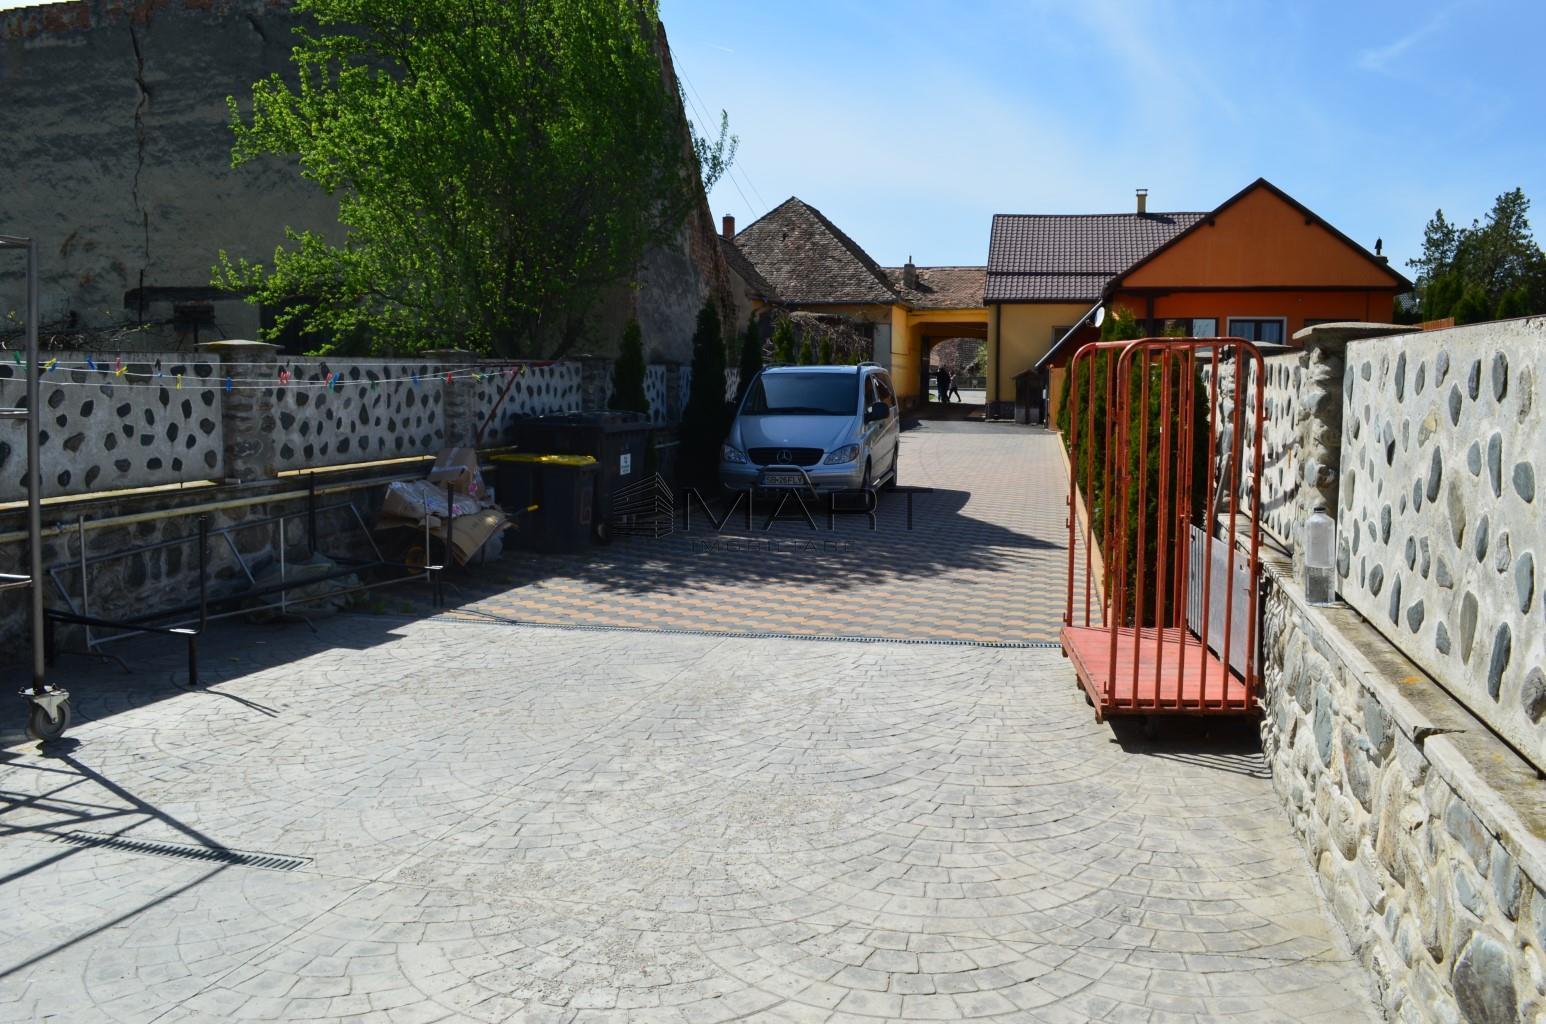 Case in Selimbar